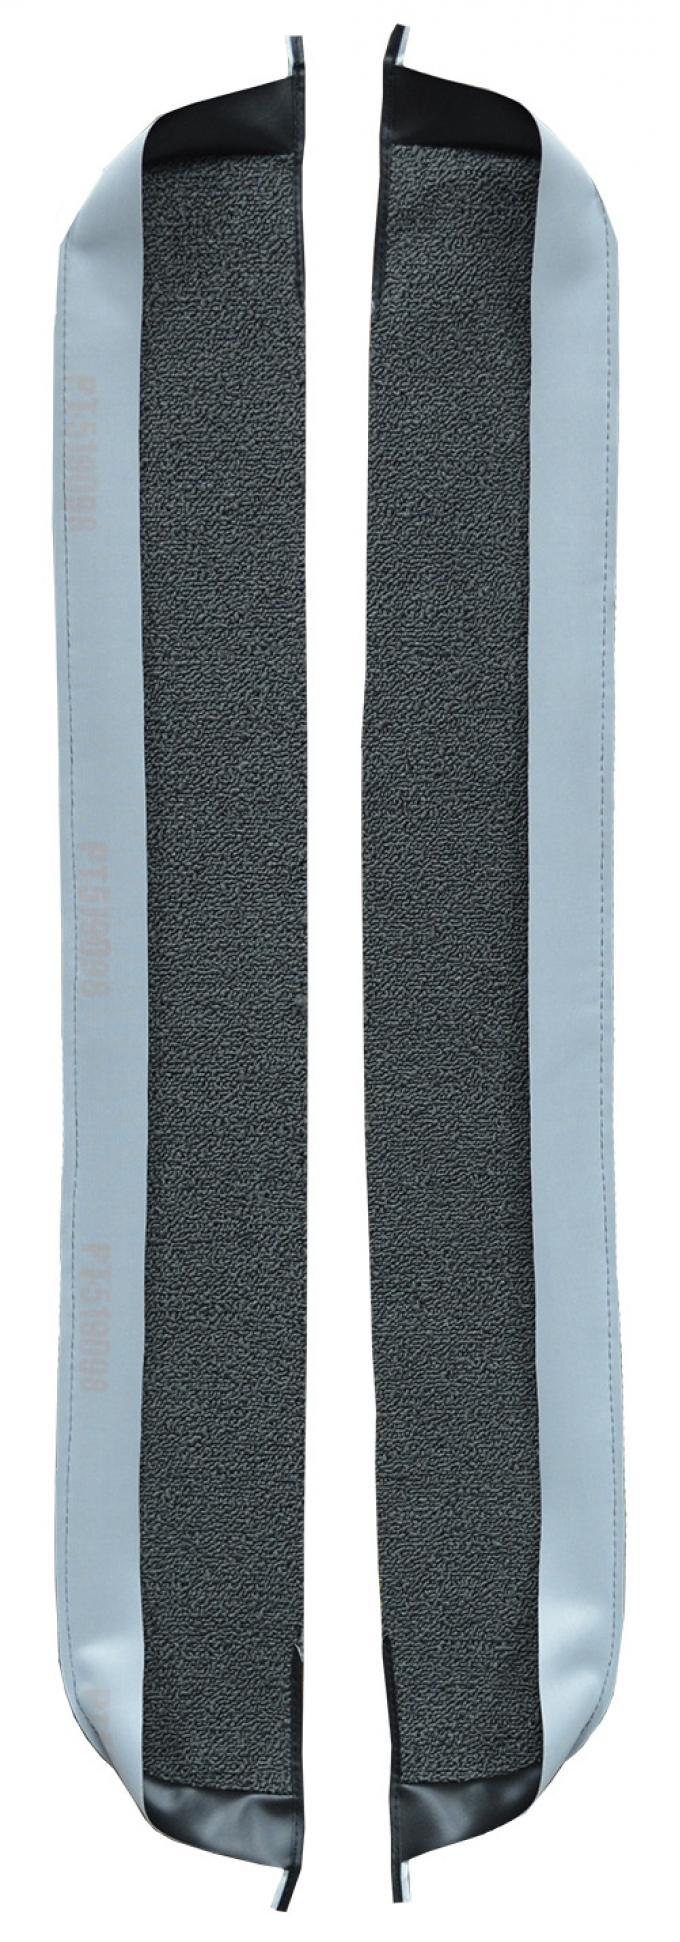 ACC  Ford Thunderbird Door Panel Inserts 2pc Loop Carpet, 1961-1963